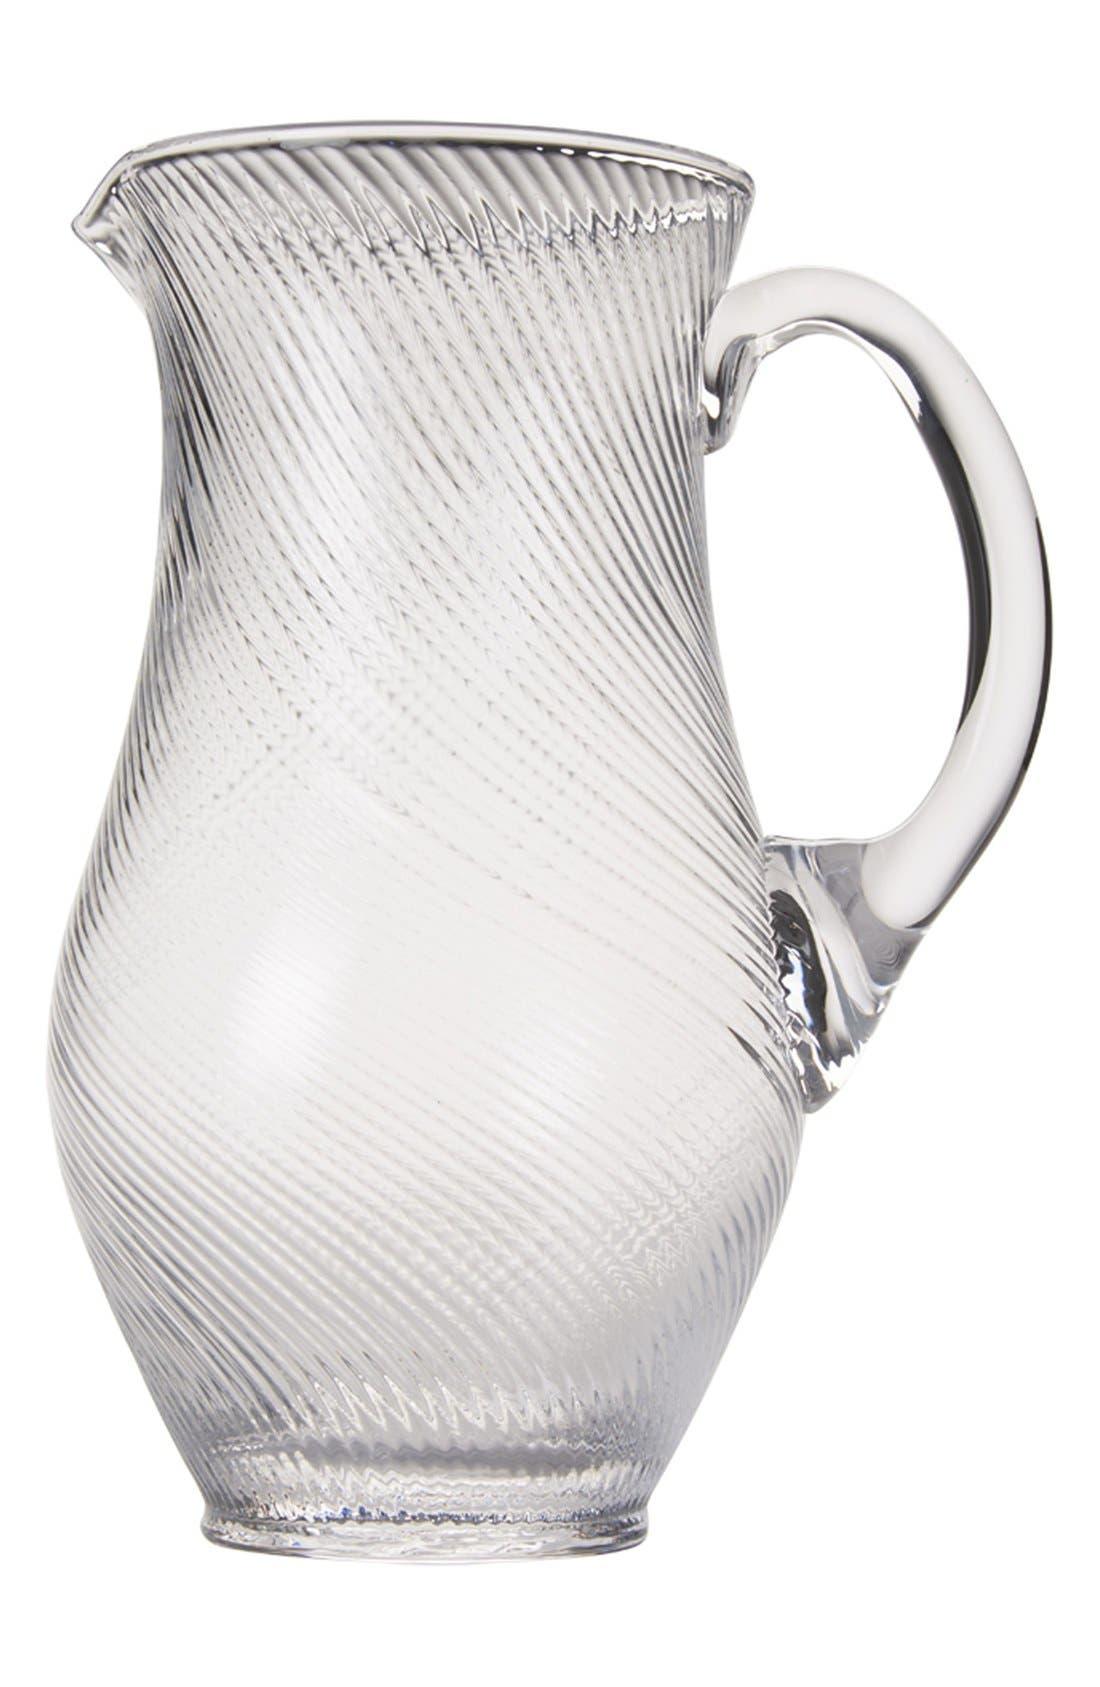 Juliska 'Arabella' Glass Pitcher